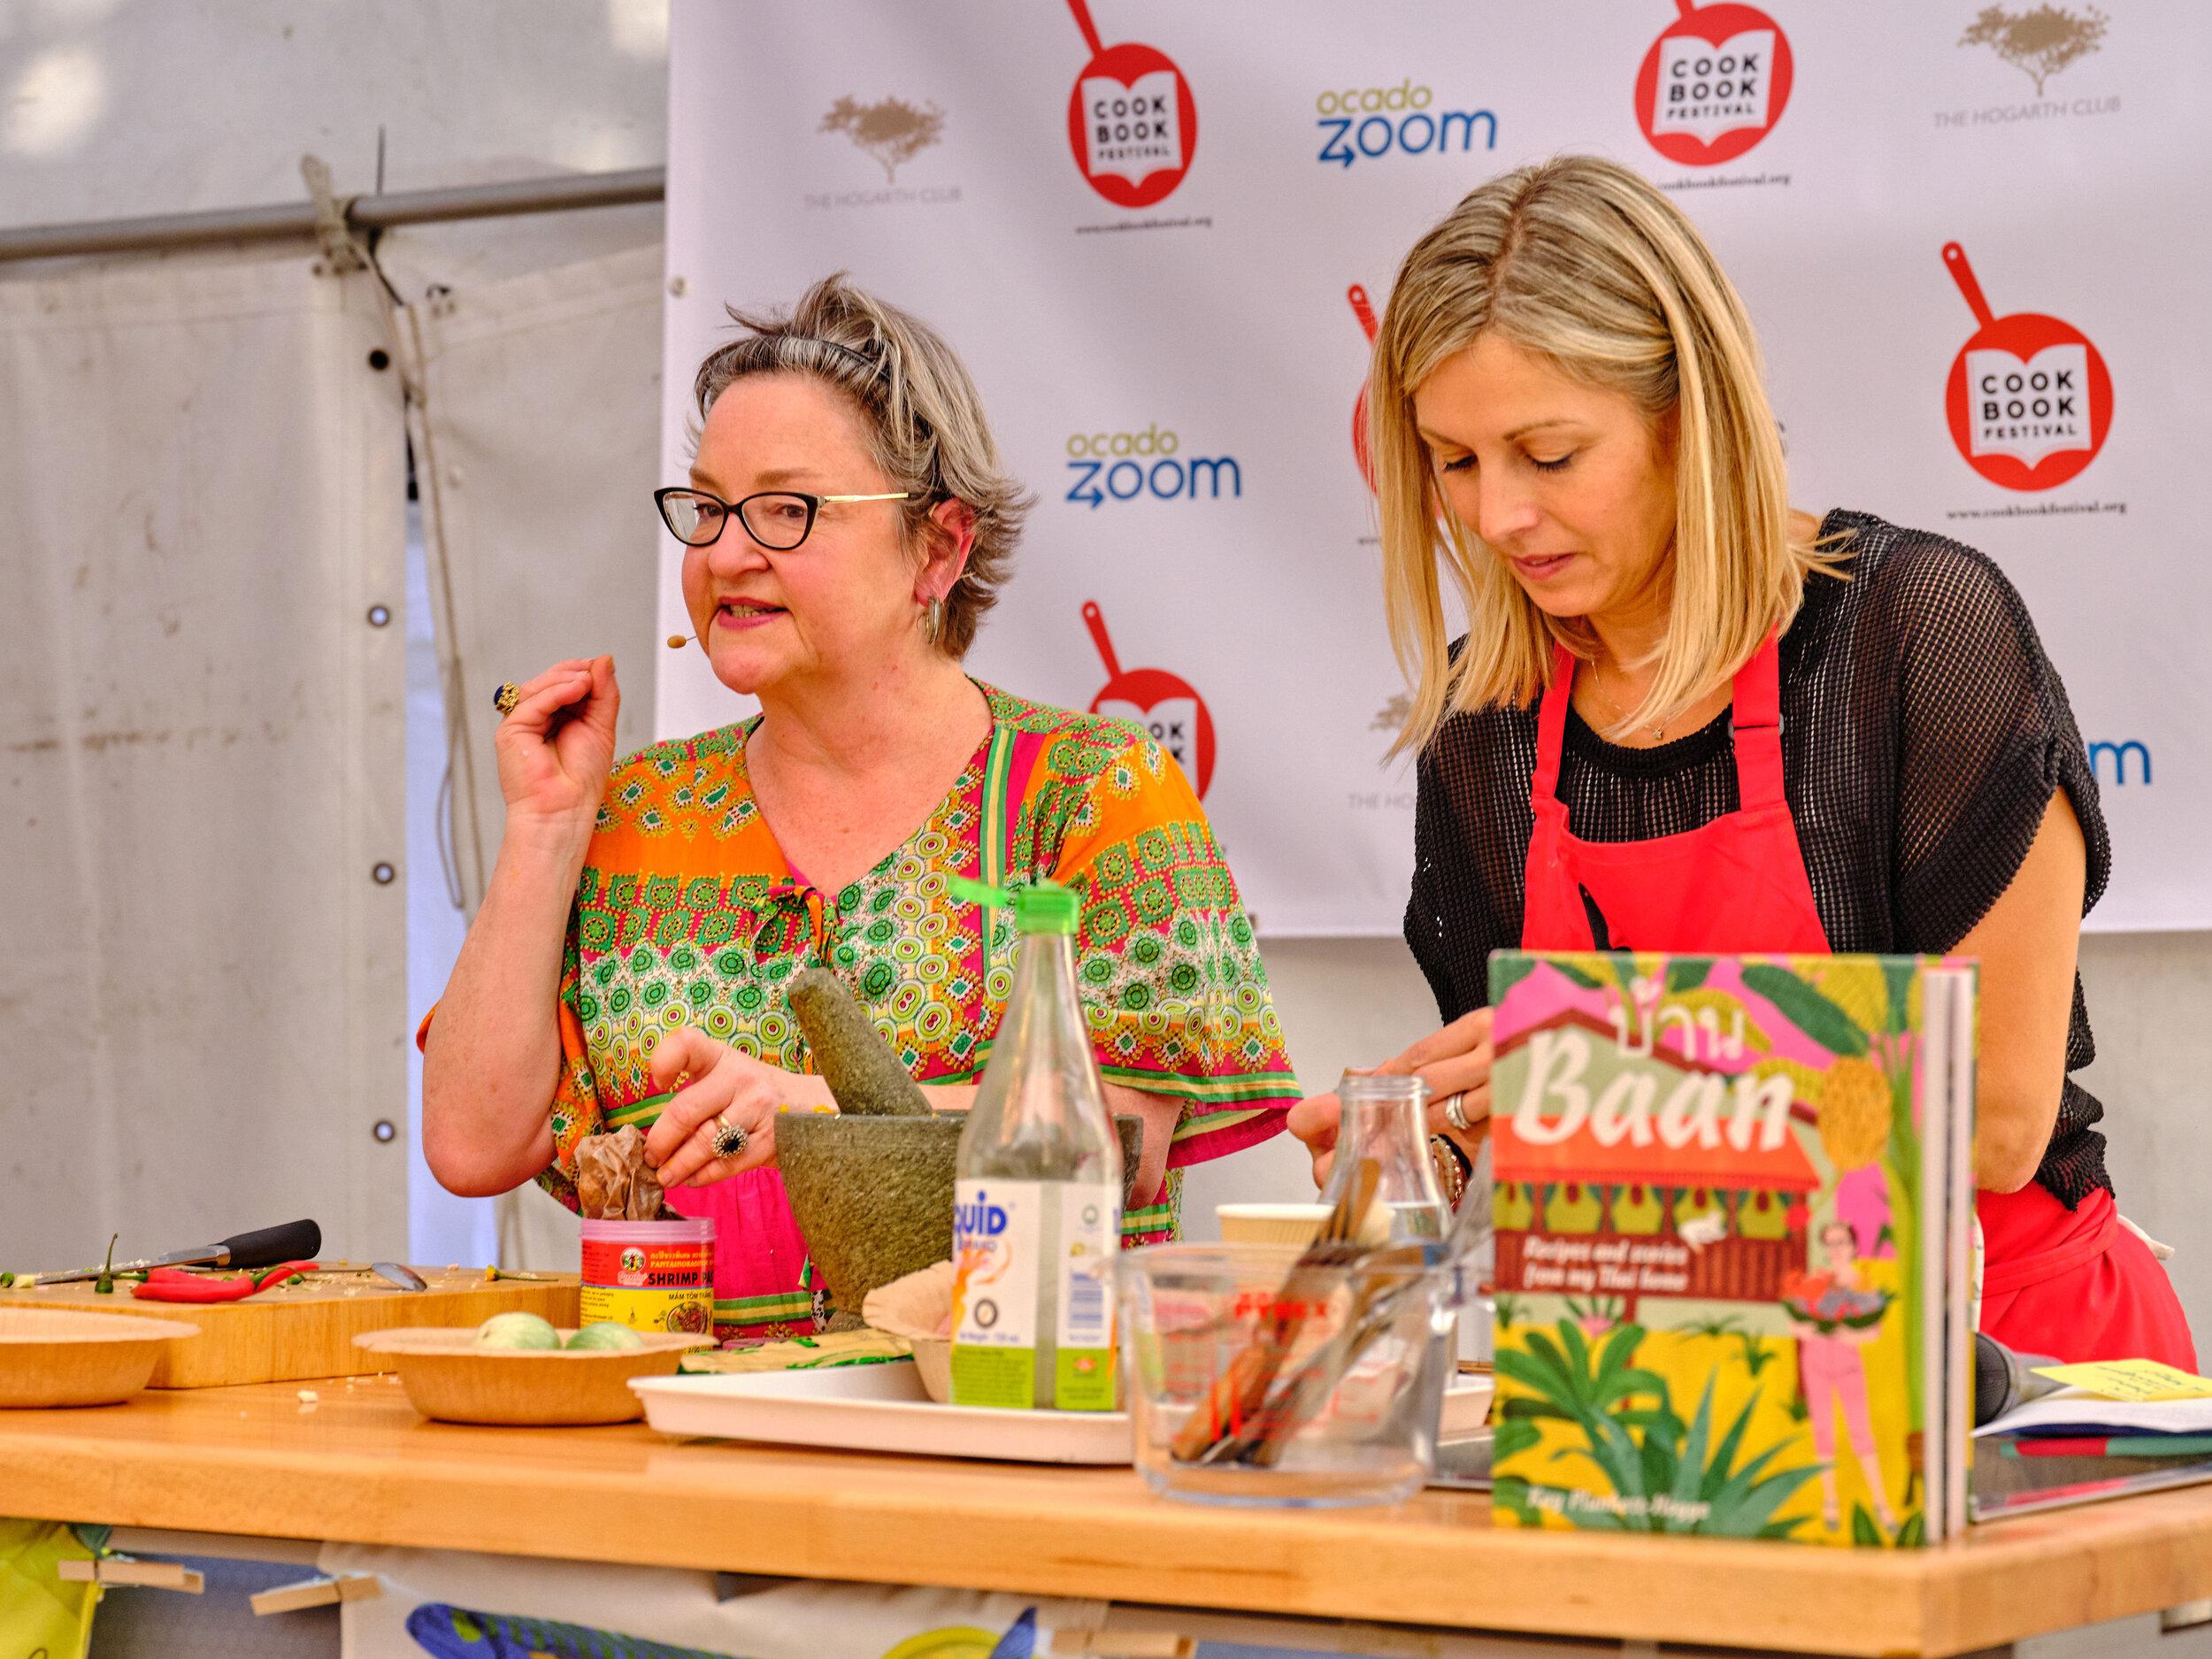 CookbookFestival20190205.jpg